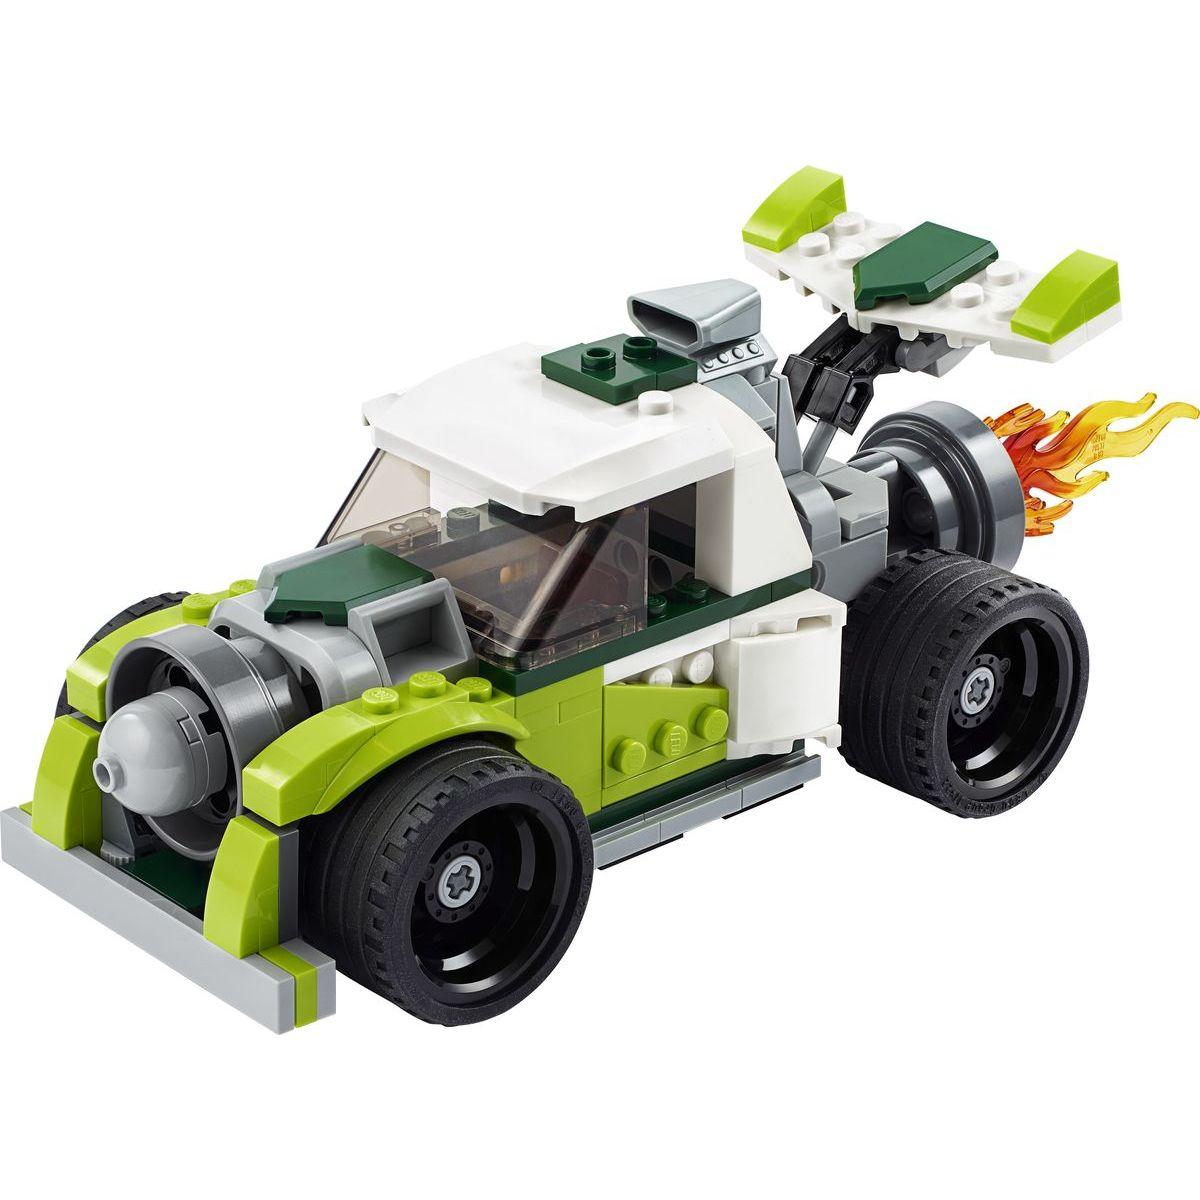 LEGO Creators 31103 Auto s raketovým pohonem